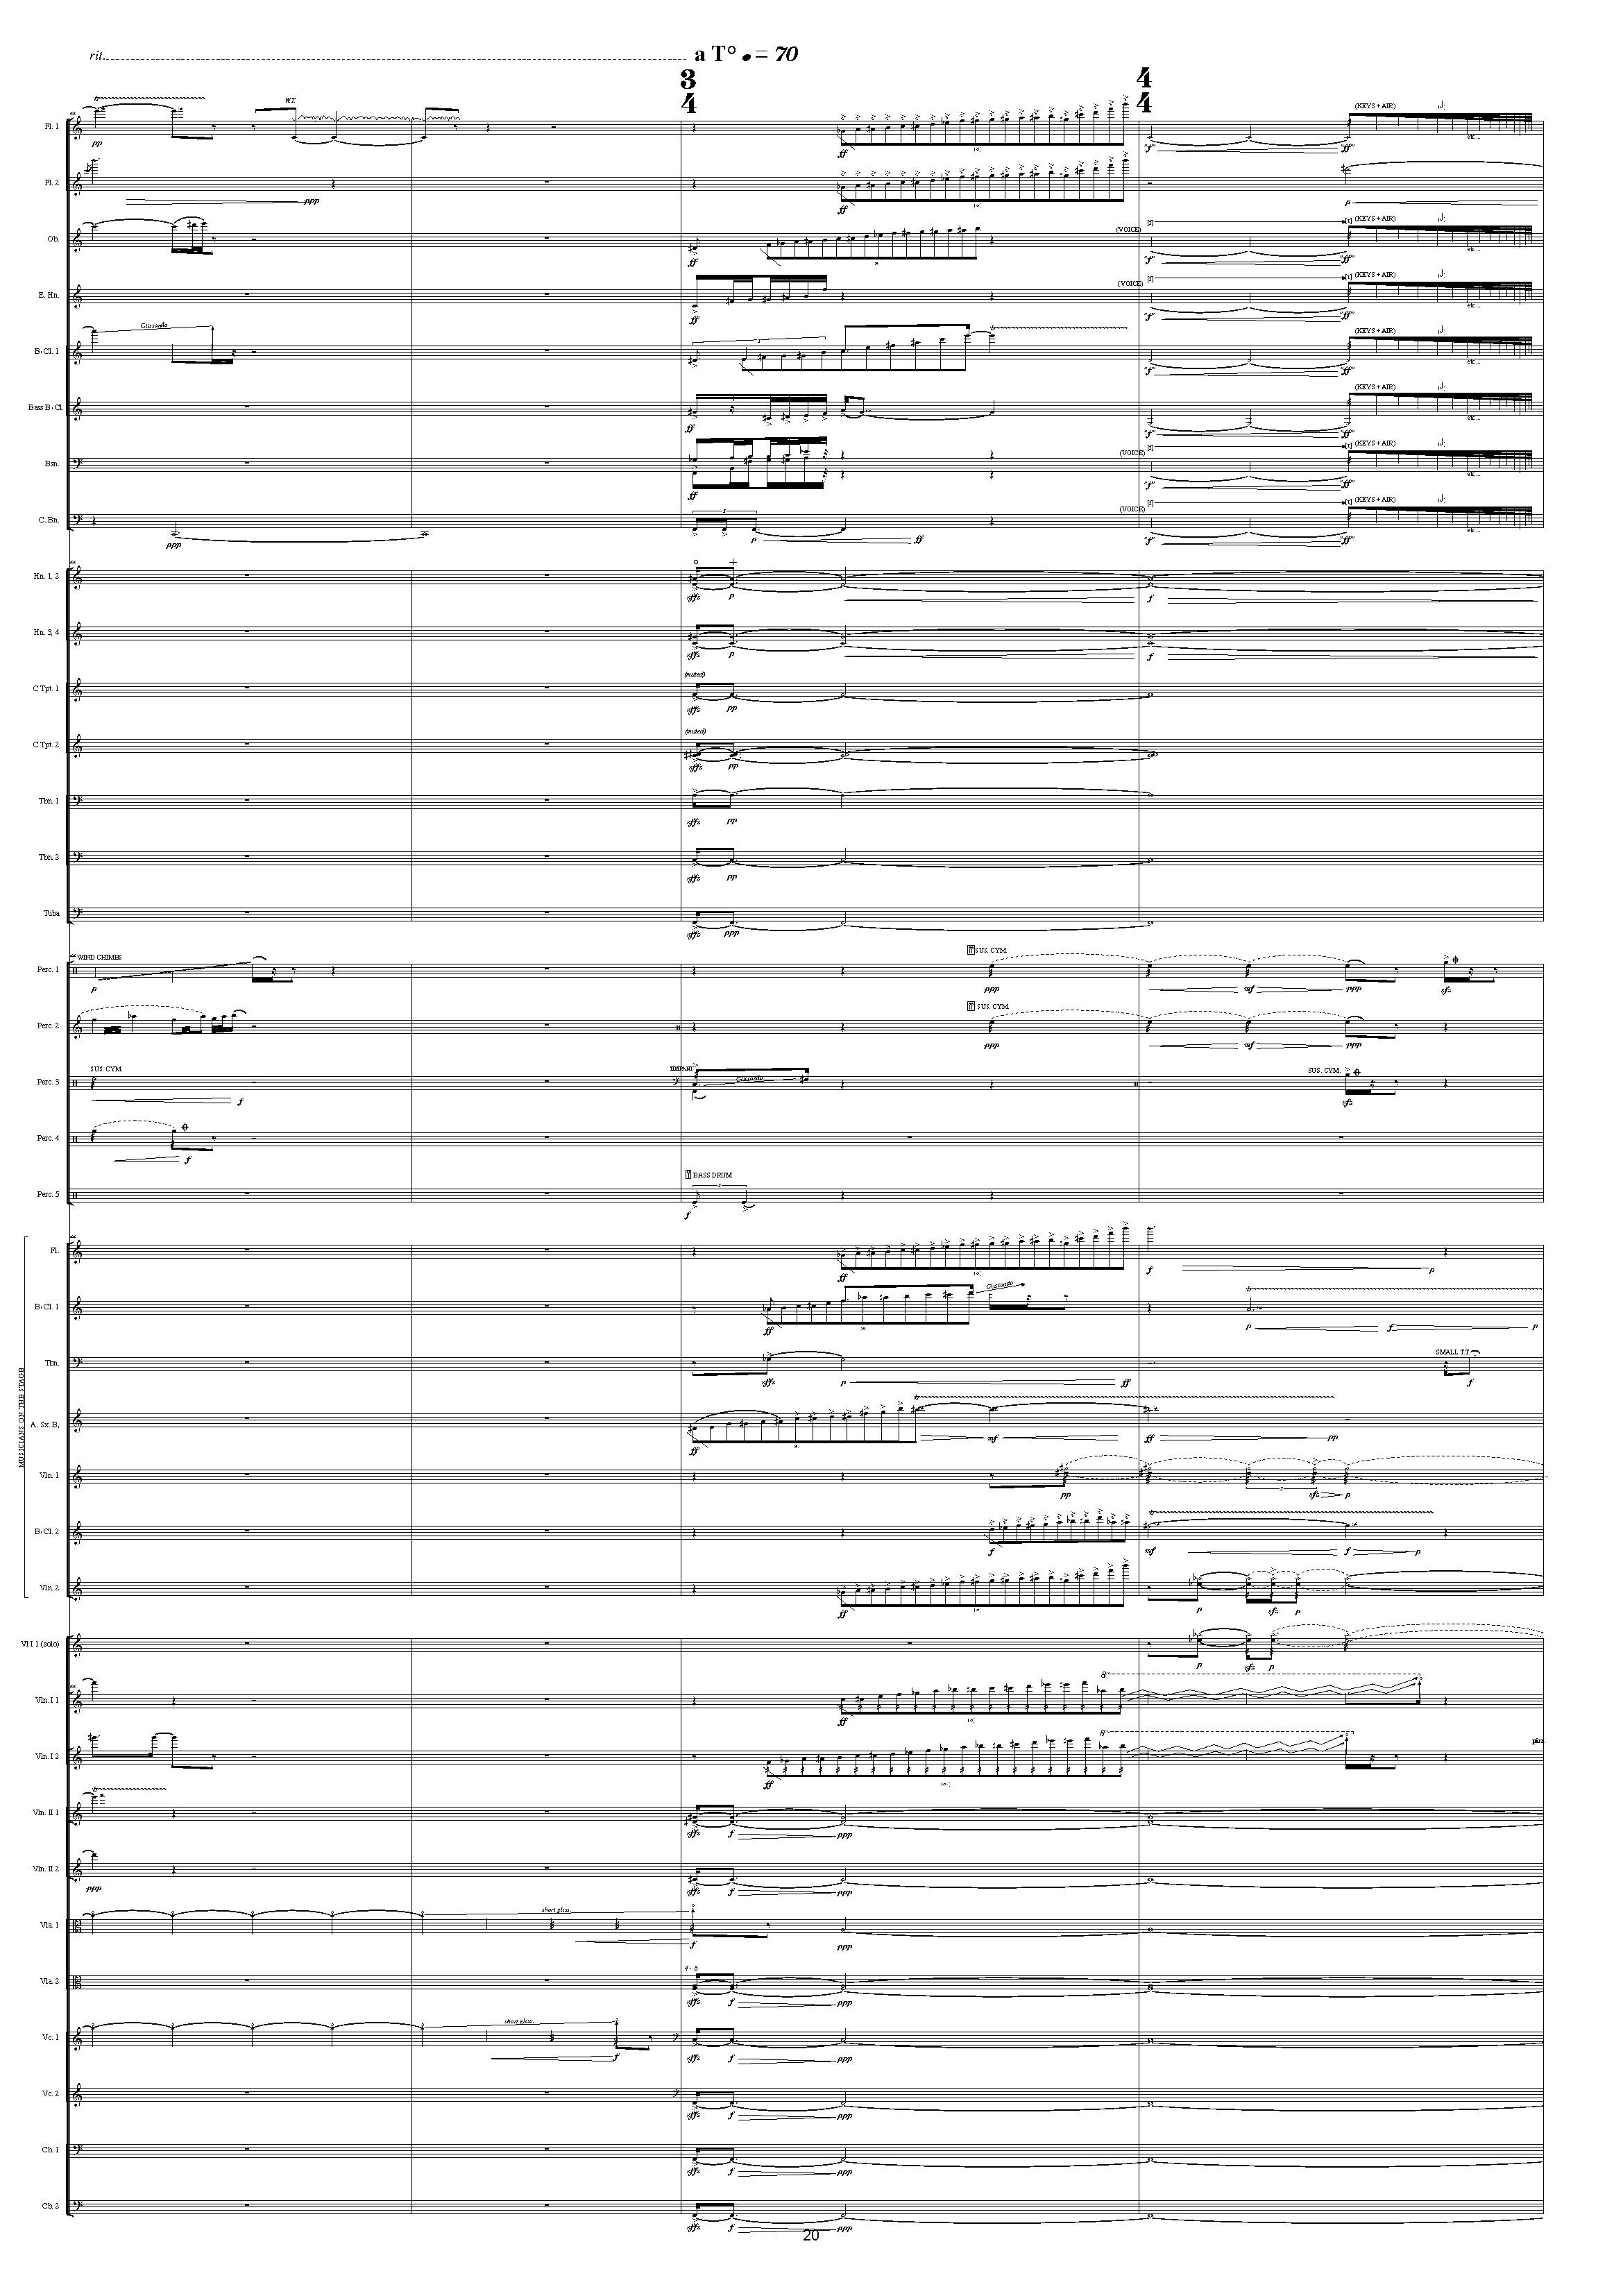 METANOIA_2009-RAPPOPORT_Seite_20.jpg